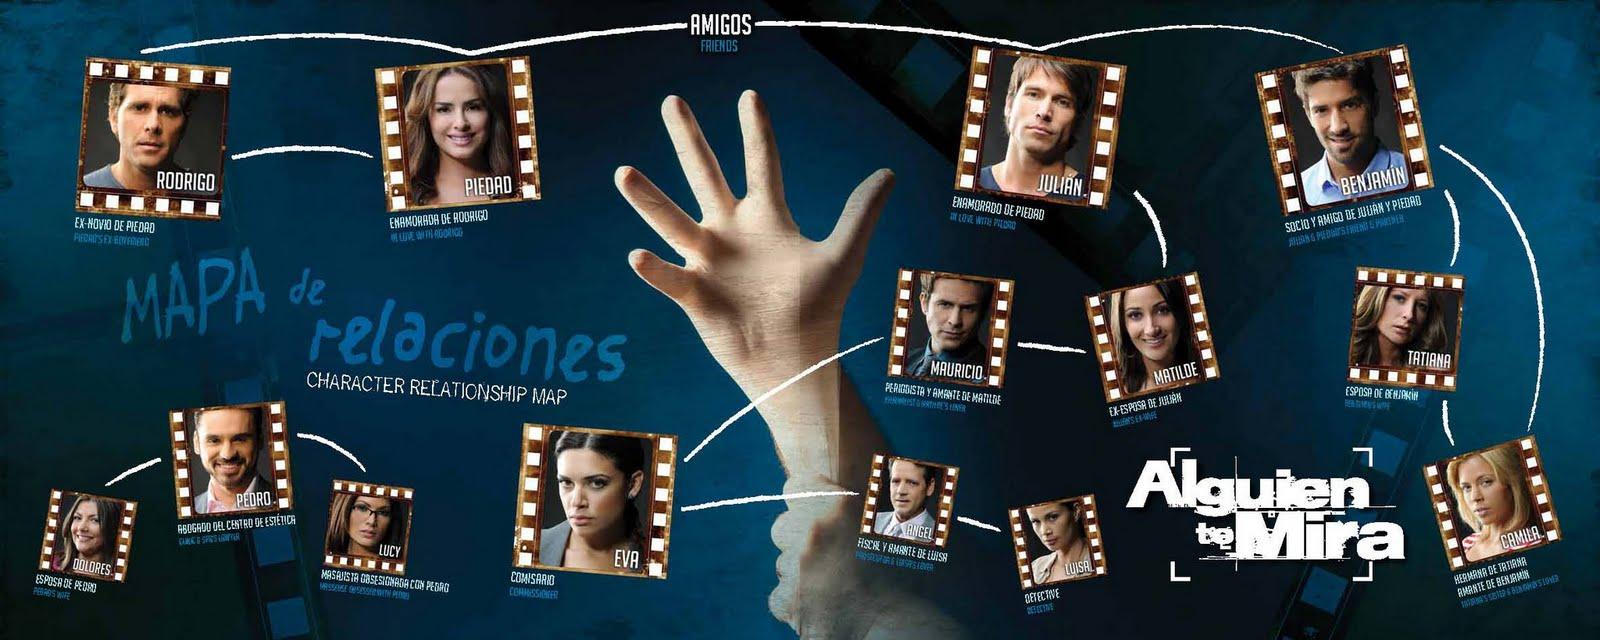 http://1.bp.blogspot.com/-Xha7CYxbtSU/Th_WgEw1pRI/AAAAAAAAAjU/i1k4bRWHwNs/s1600/Alguien+te+Mira+%25288%2529.jpg